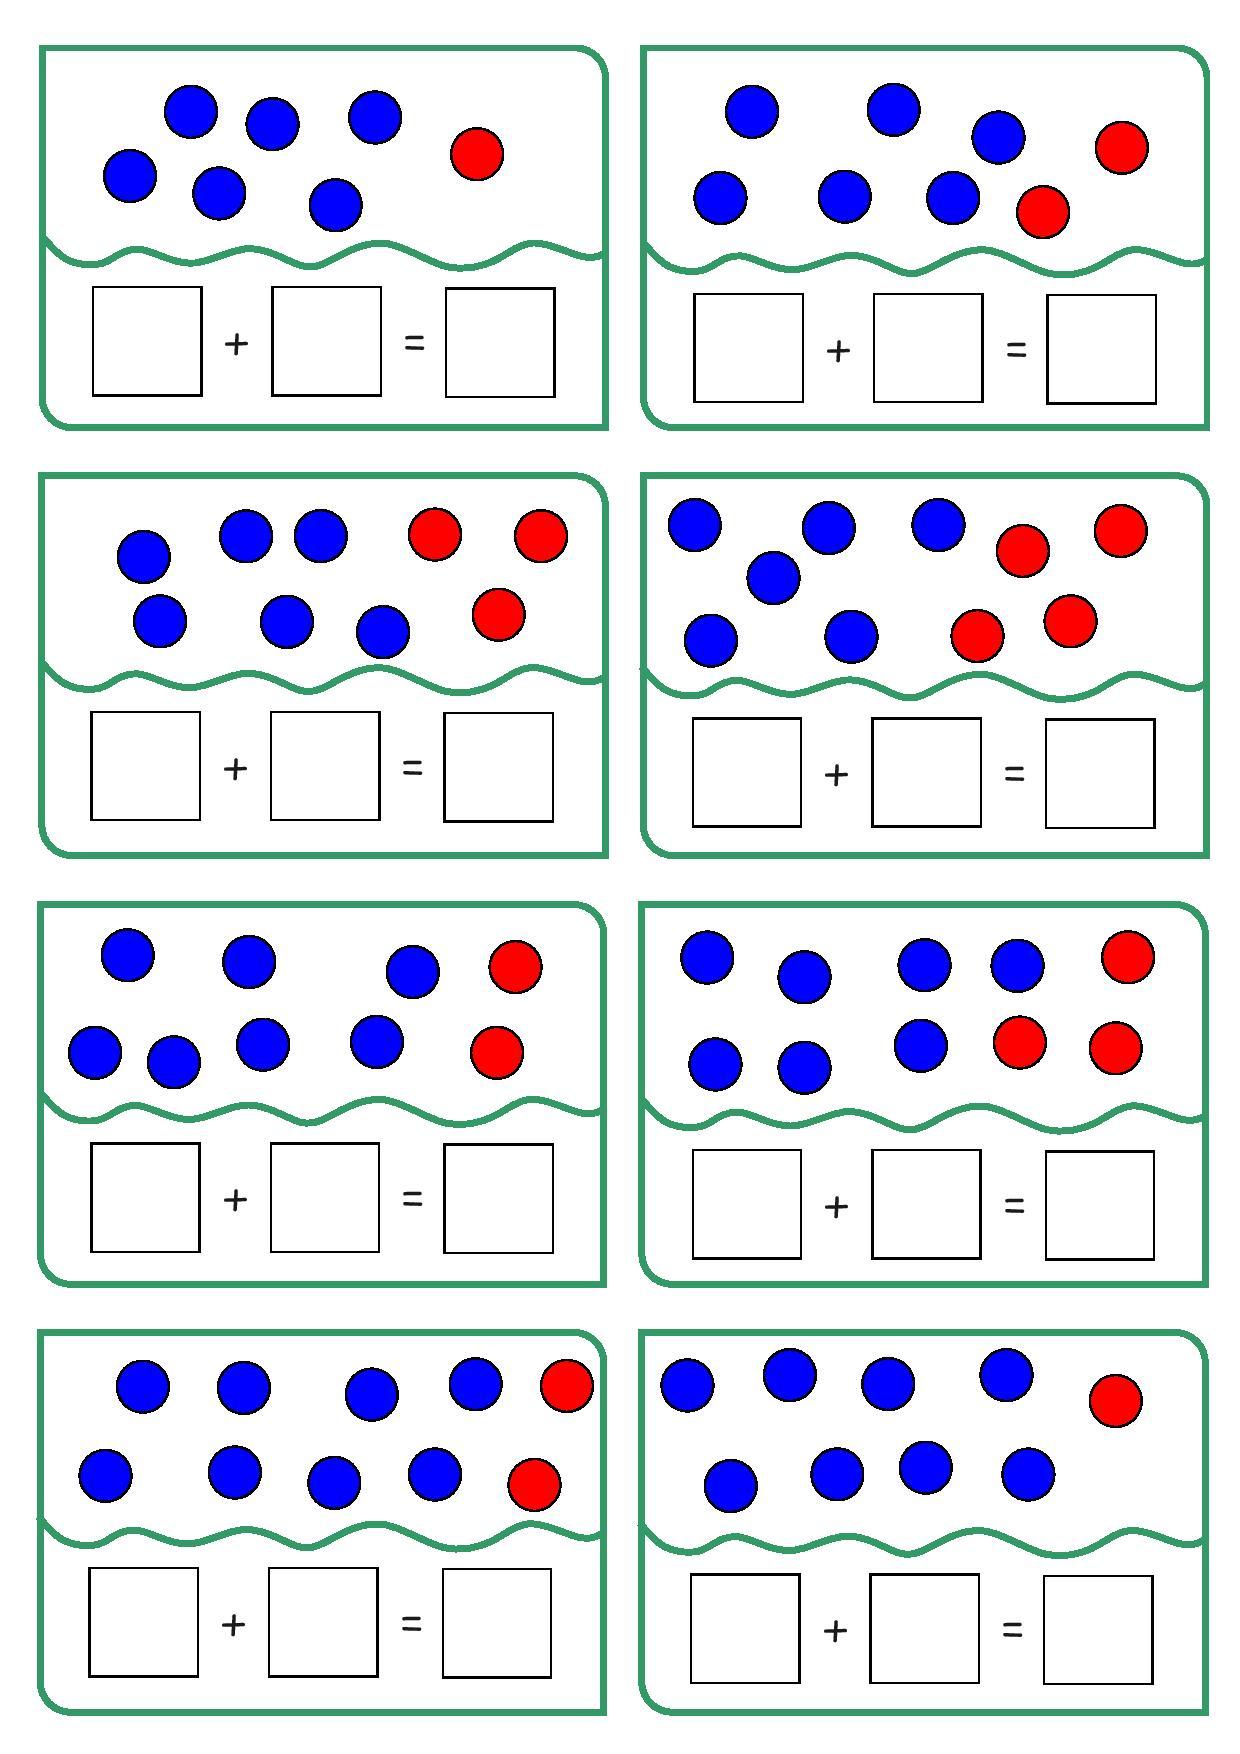 Addition worksheets for kids – Fun Addition Worksheets